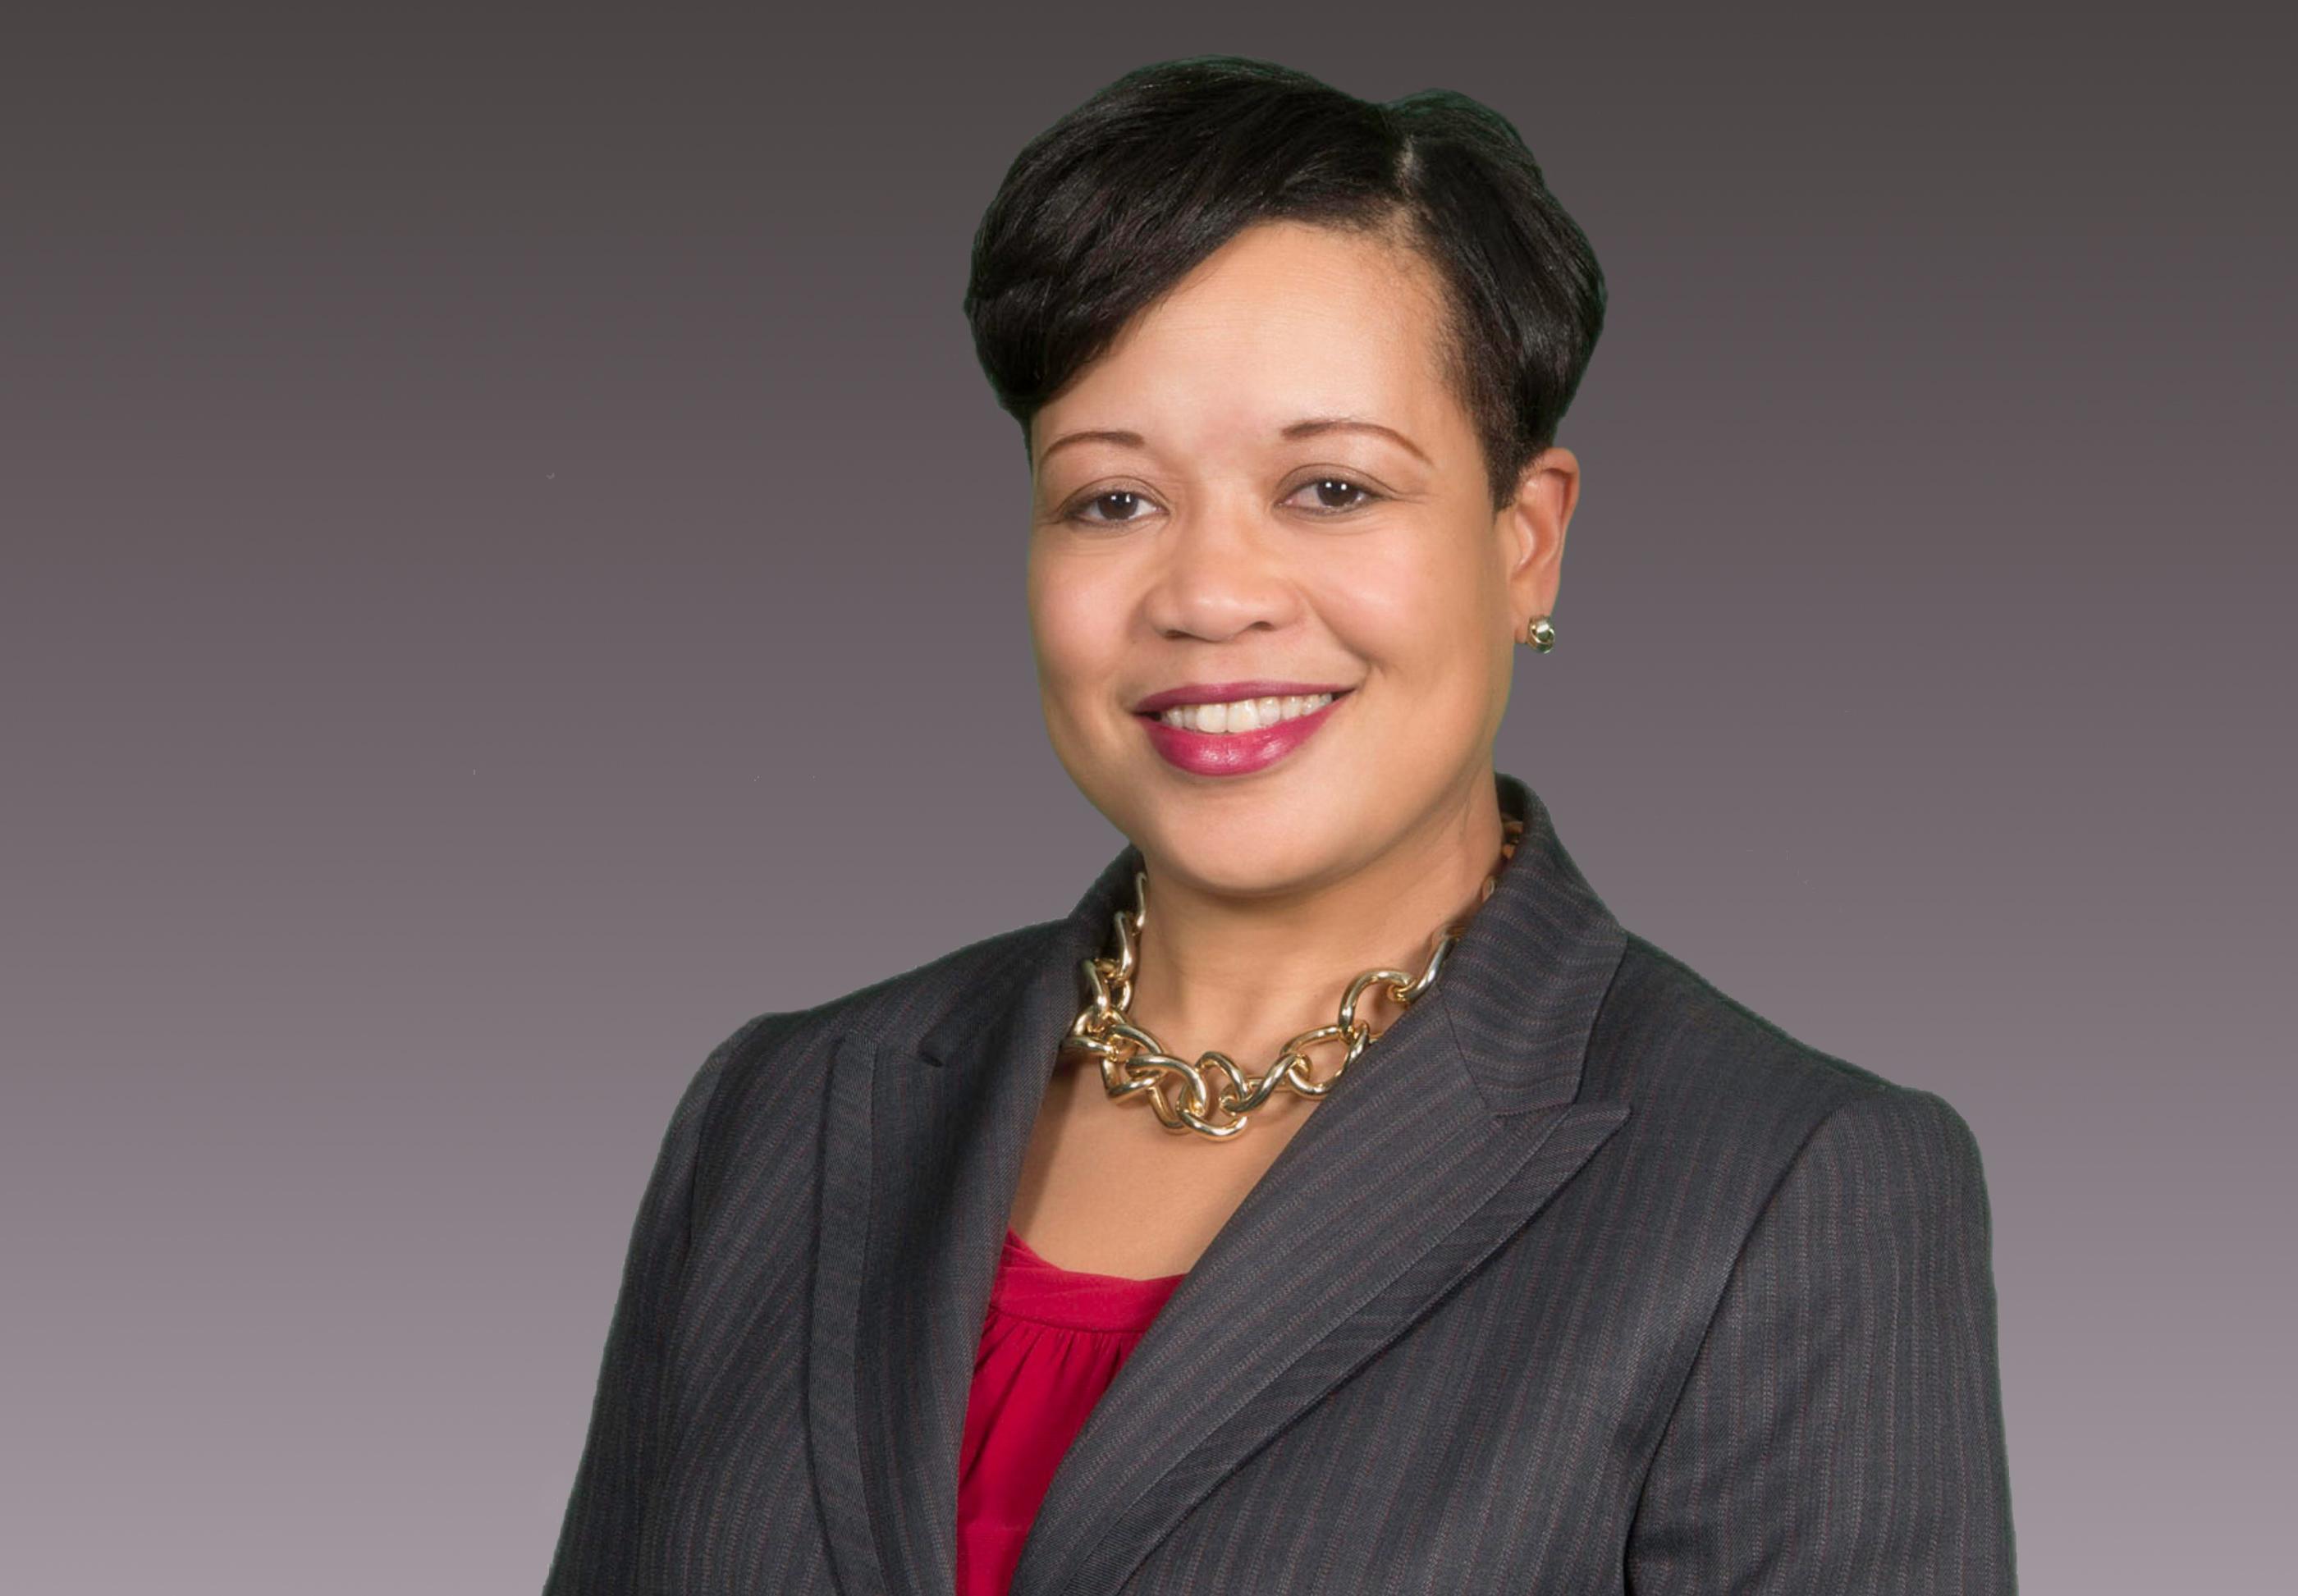 Joelle A. Murchison, Associate Vice President for Diversity, University of Connecticut.